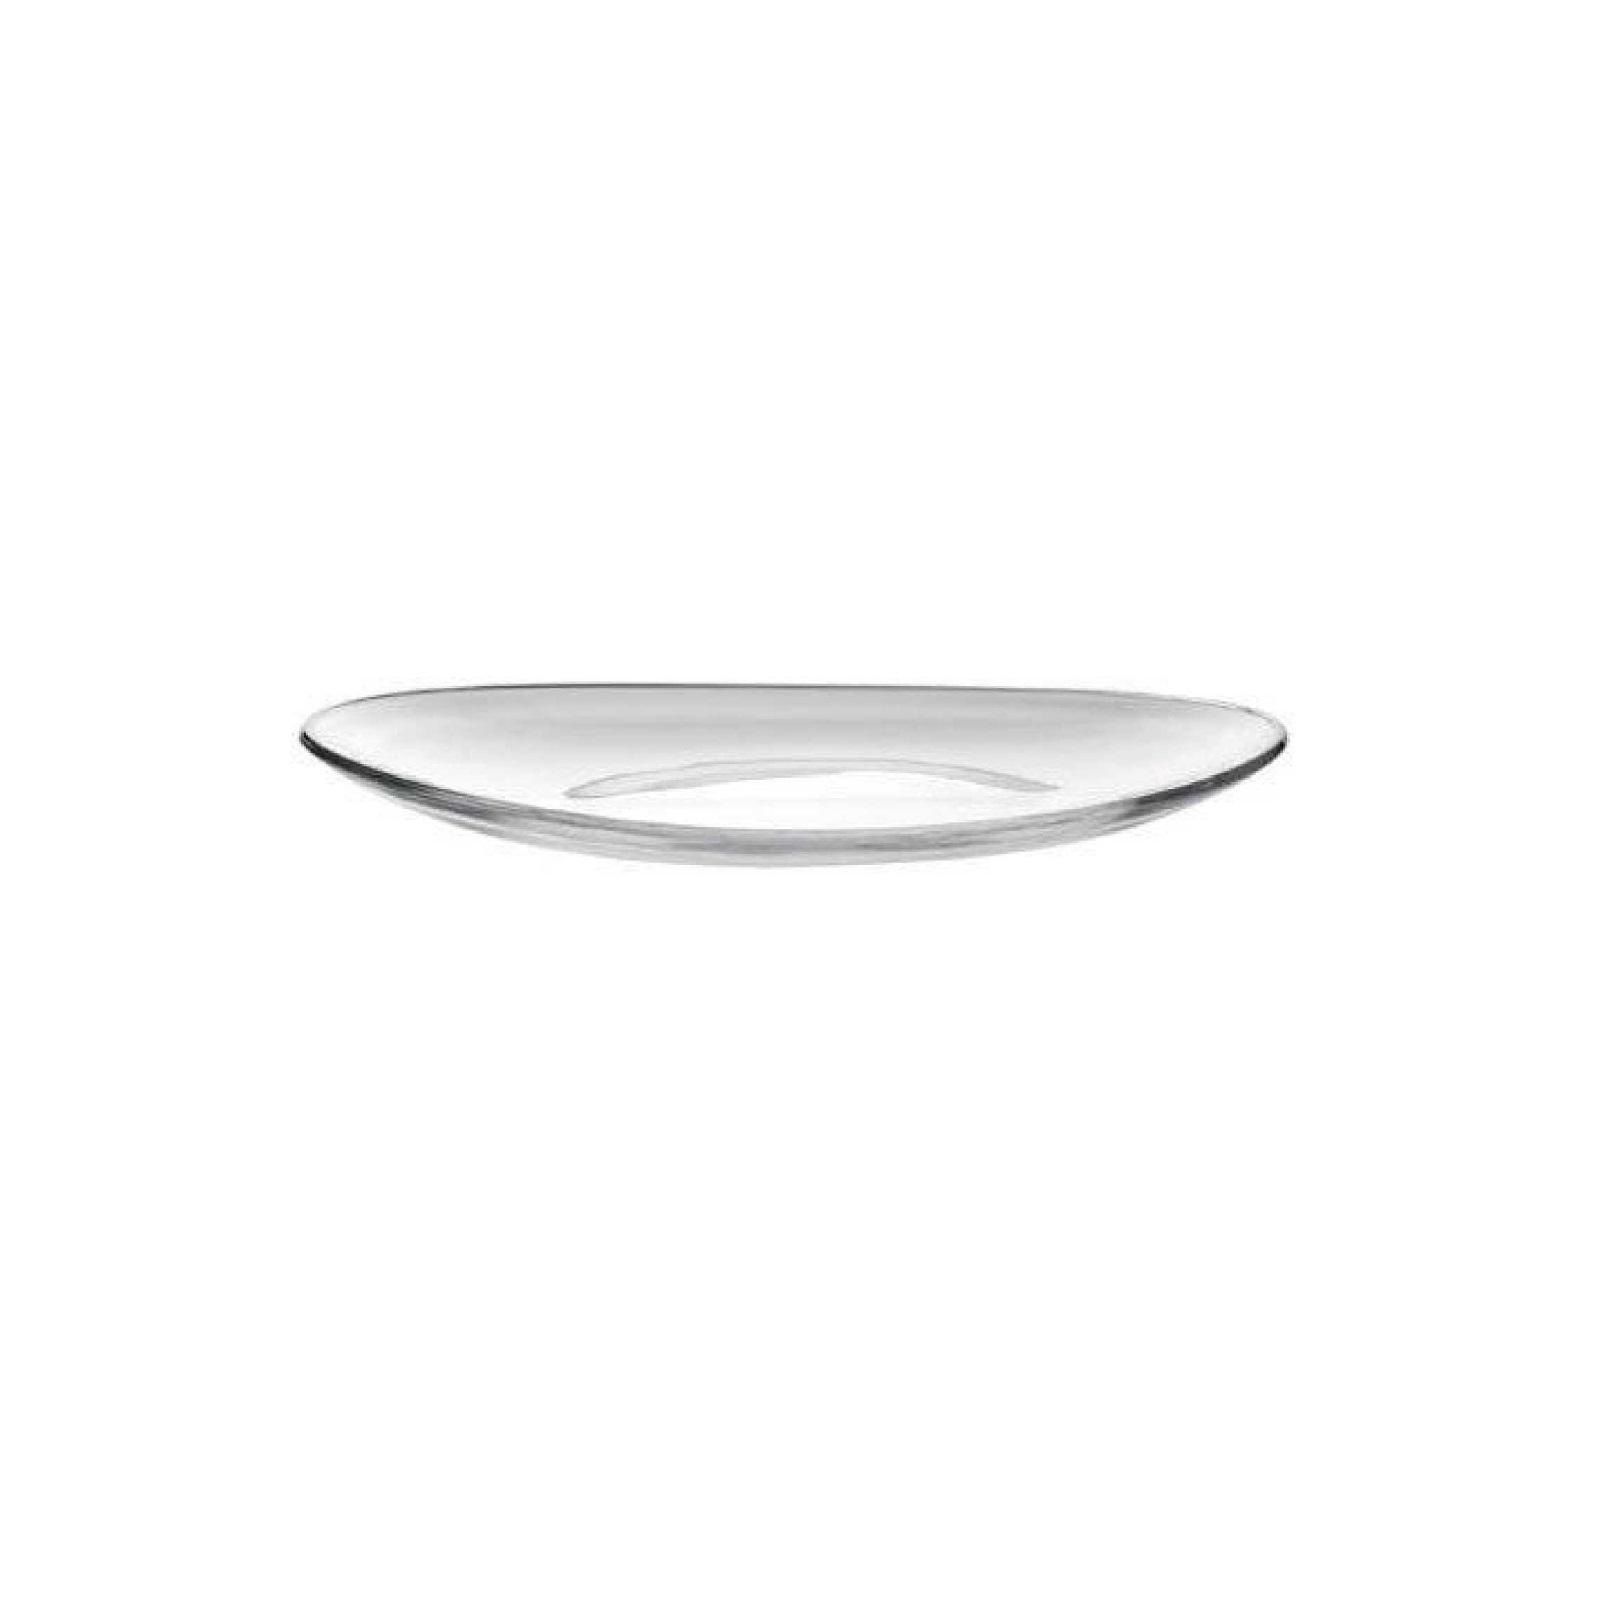 Блюдо сервировочное Schott Zwiesel ARRONDI, длина 35 см, прозрачный Schott Zwiesel 114682 фото 1